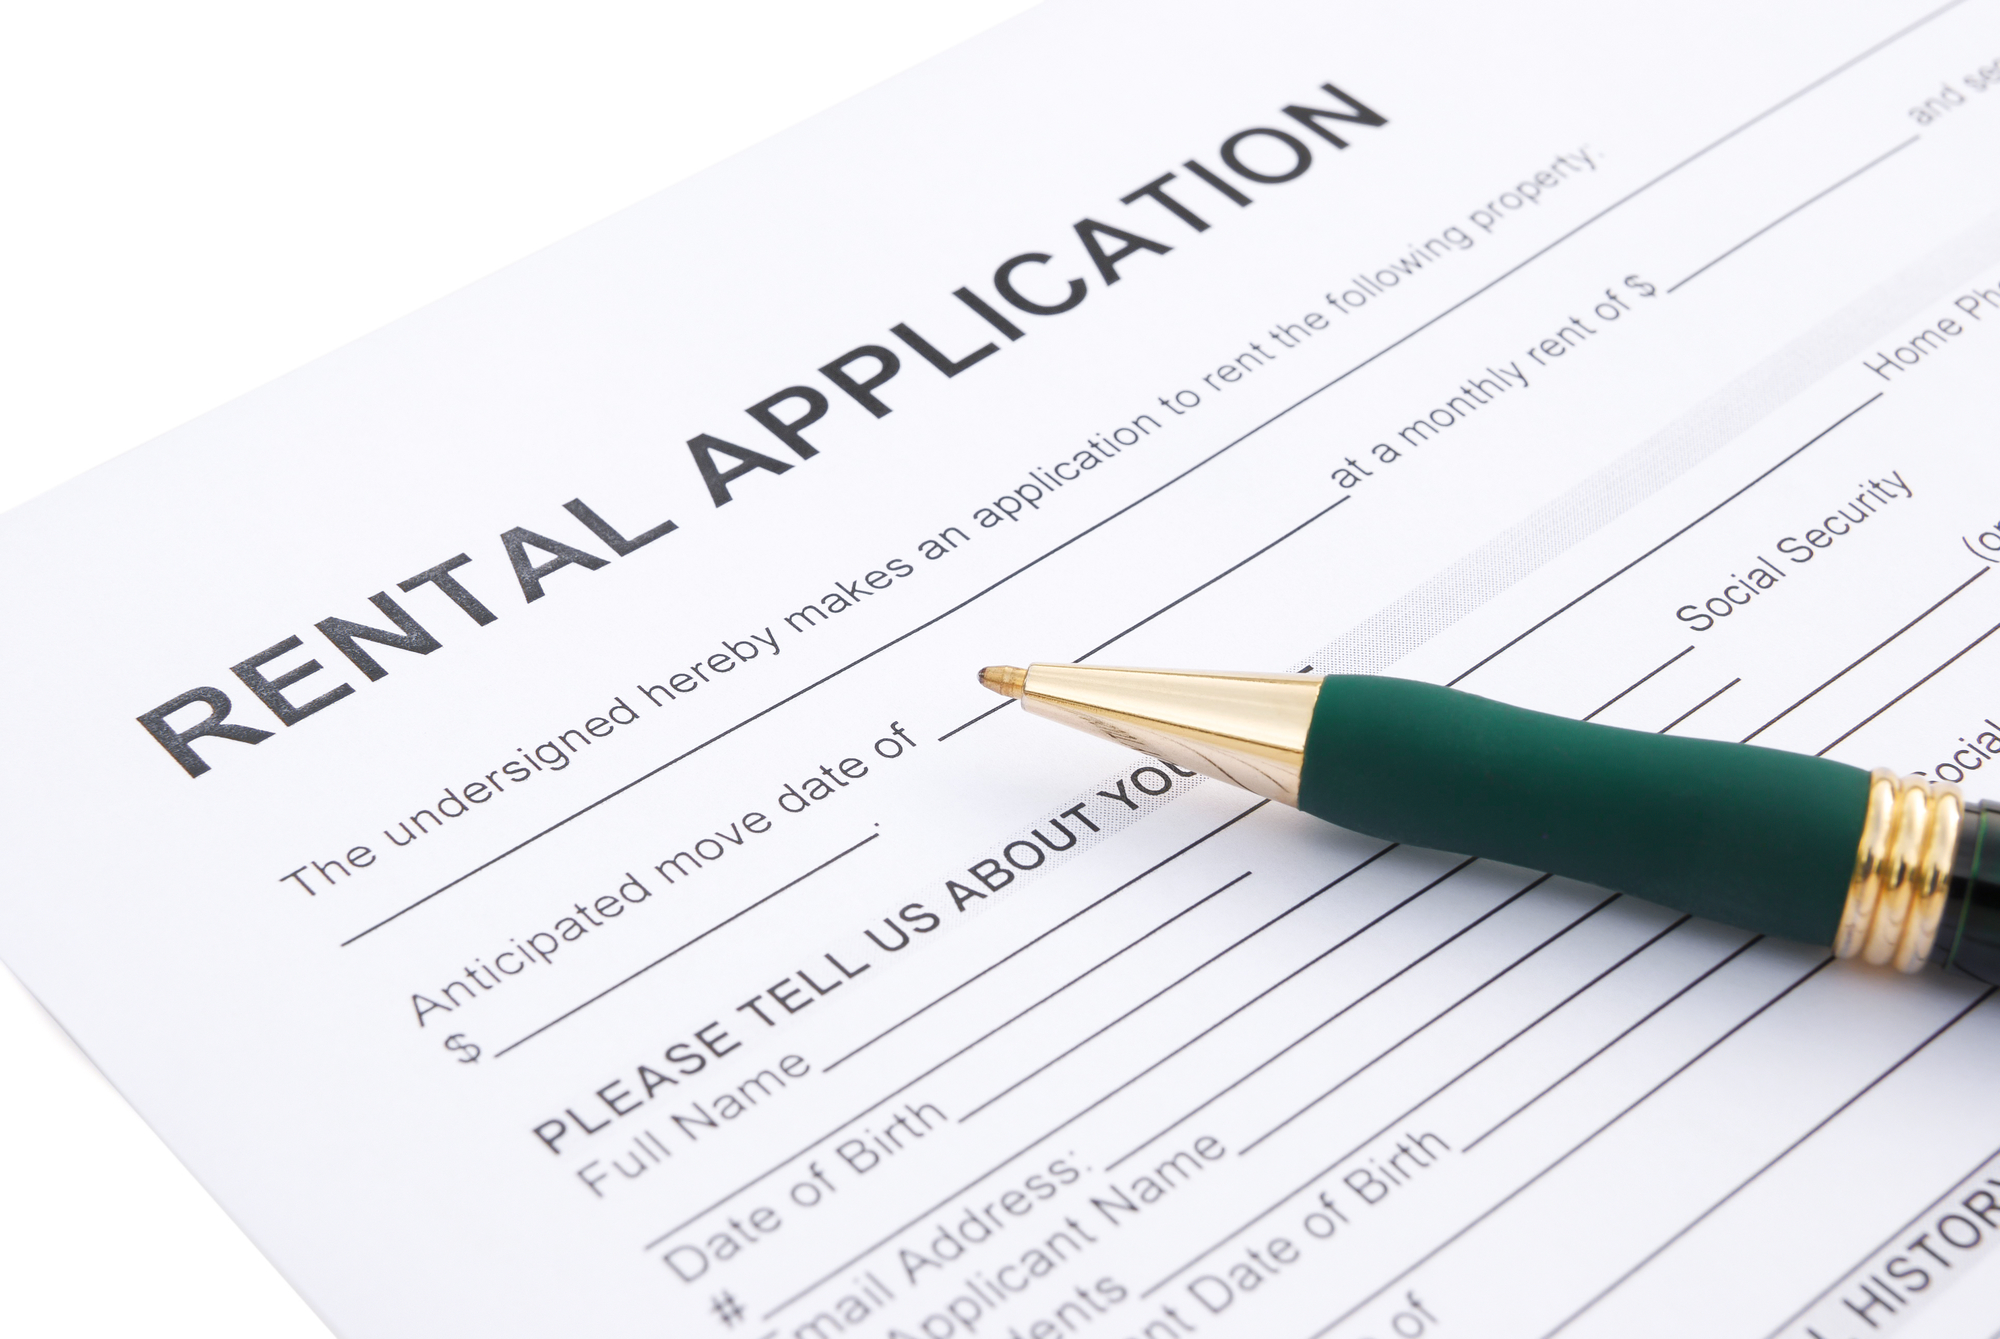 Rental agreement close up, rental property